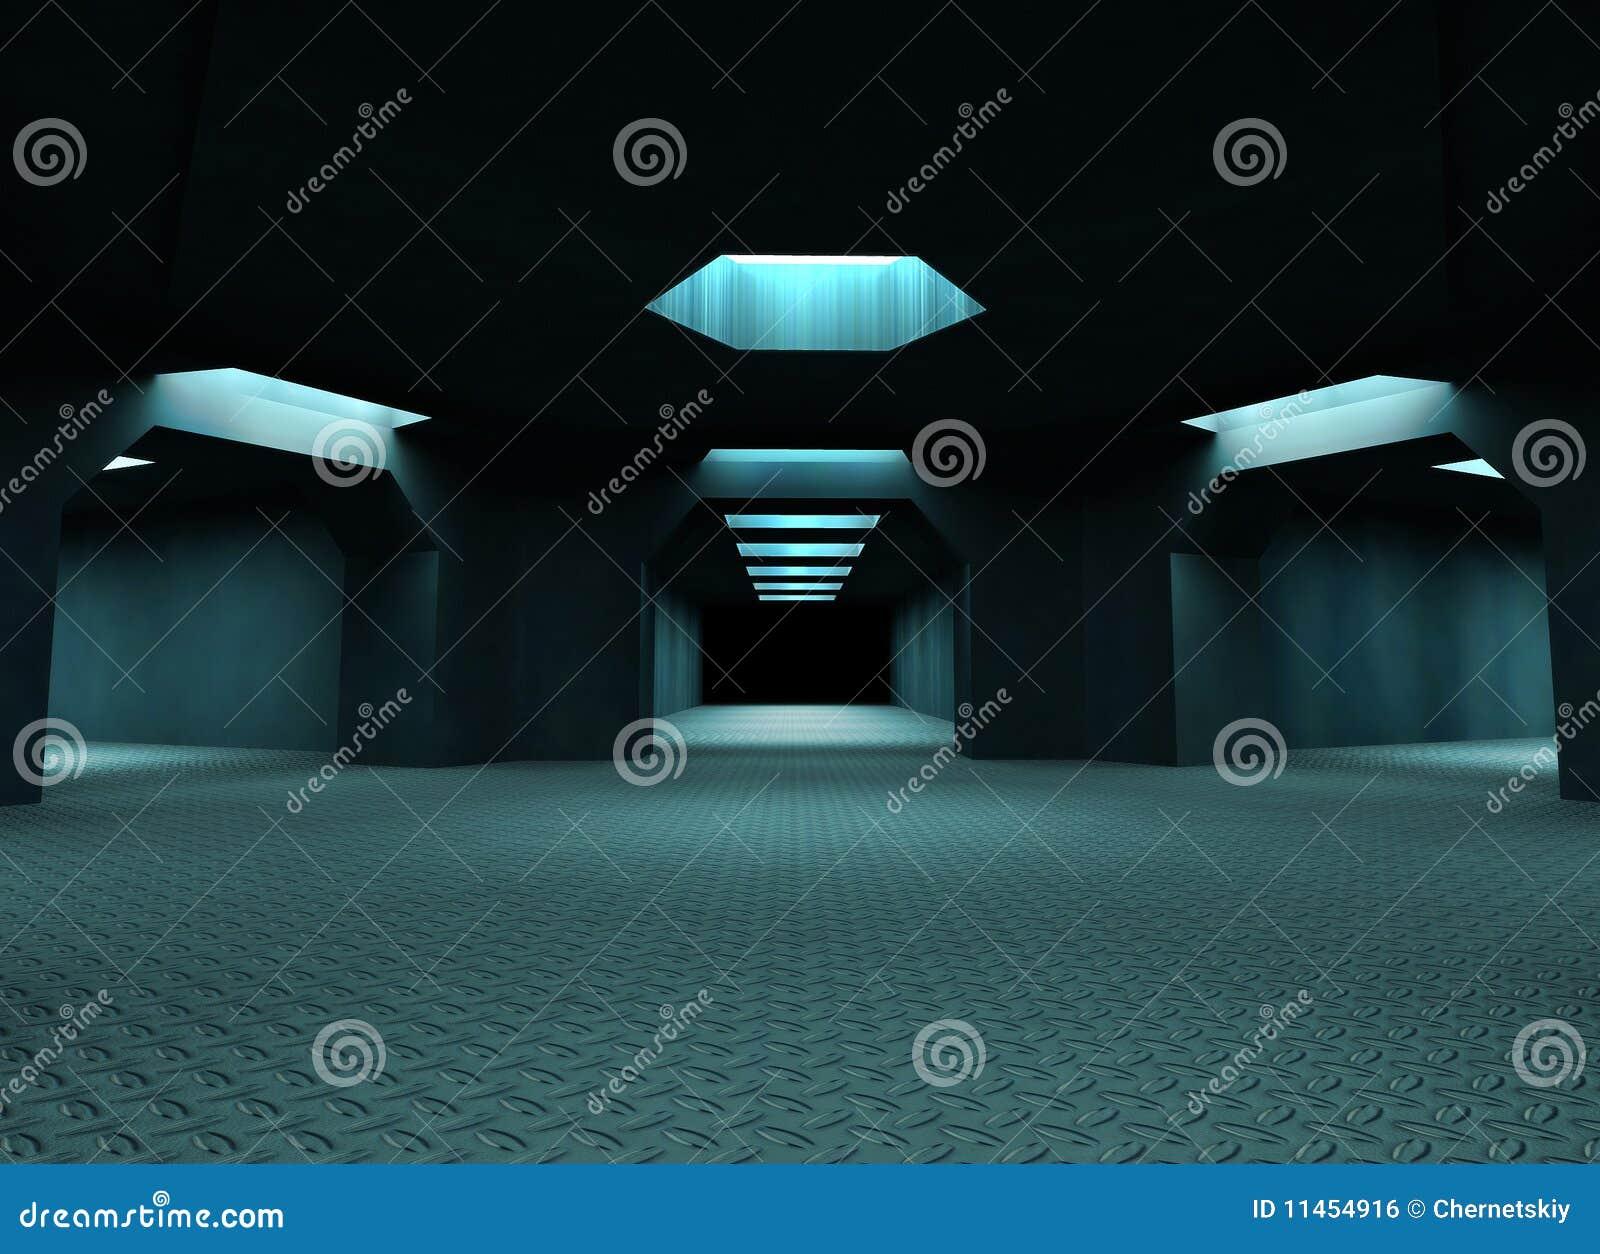 Túneles misteriosos oscuros